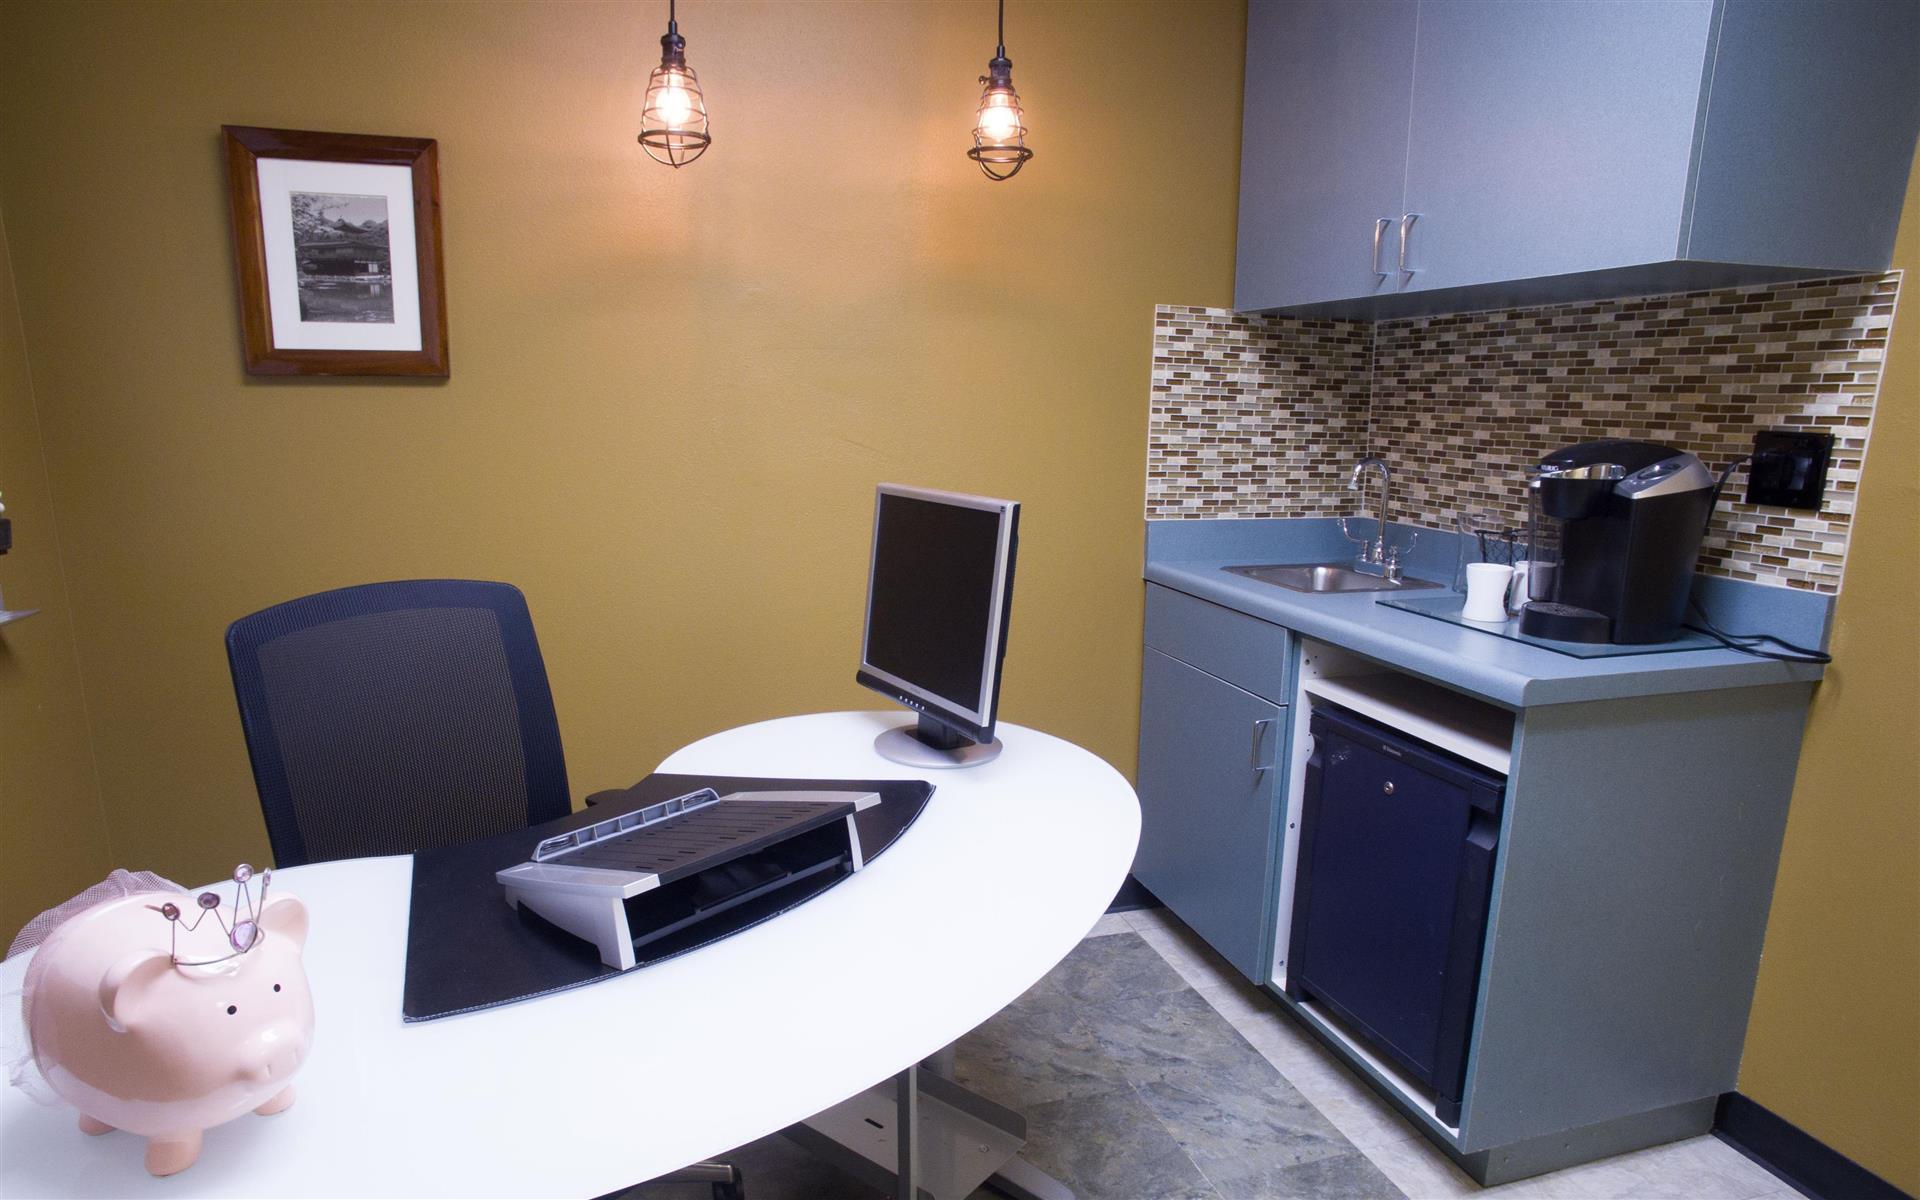 NEST CoWork (CyberTECH Community) - 1 Desk Private Office Suite